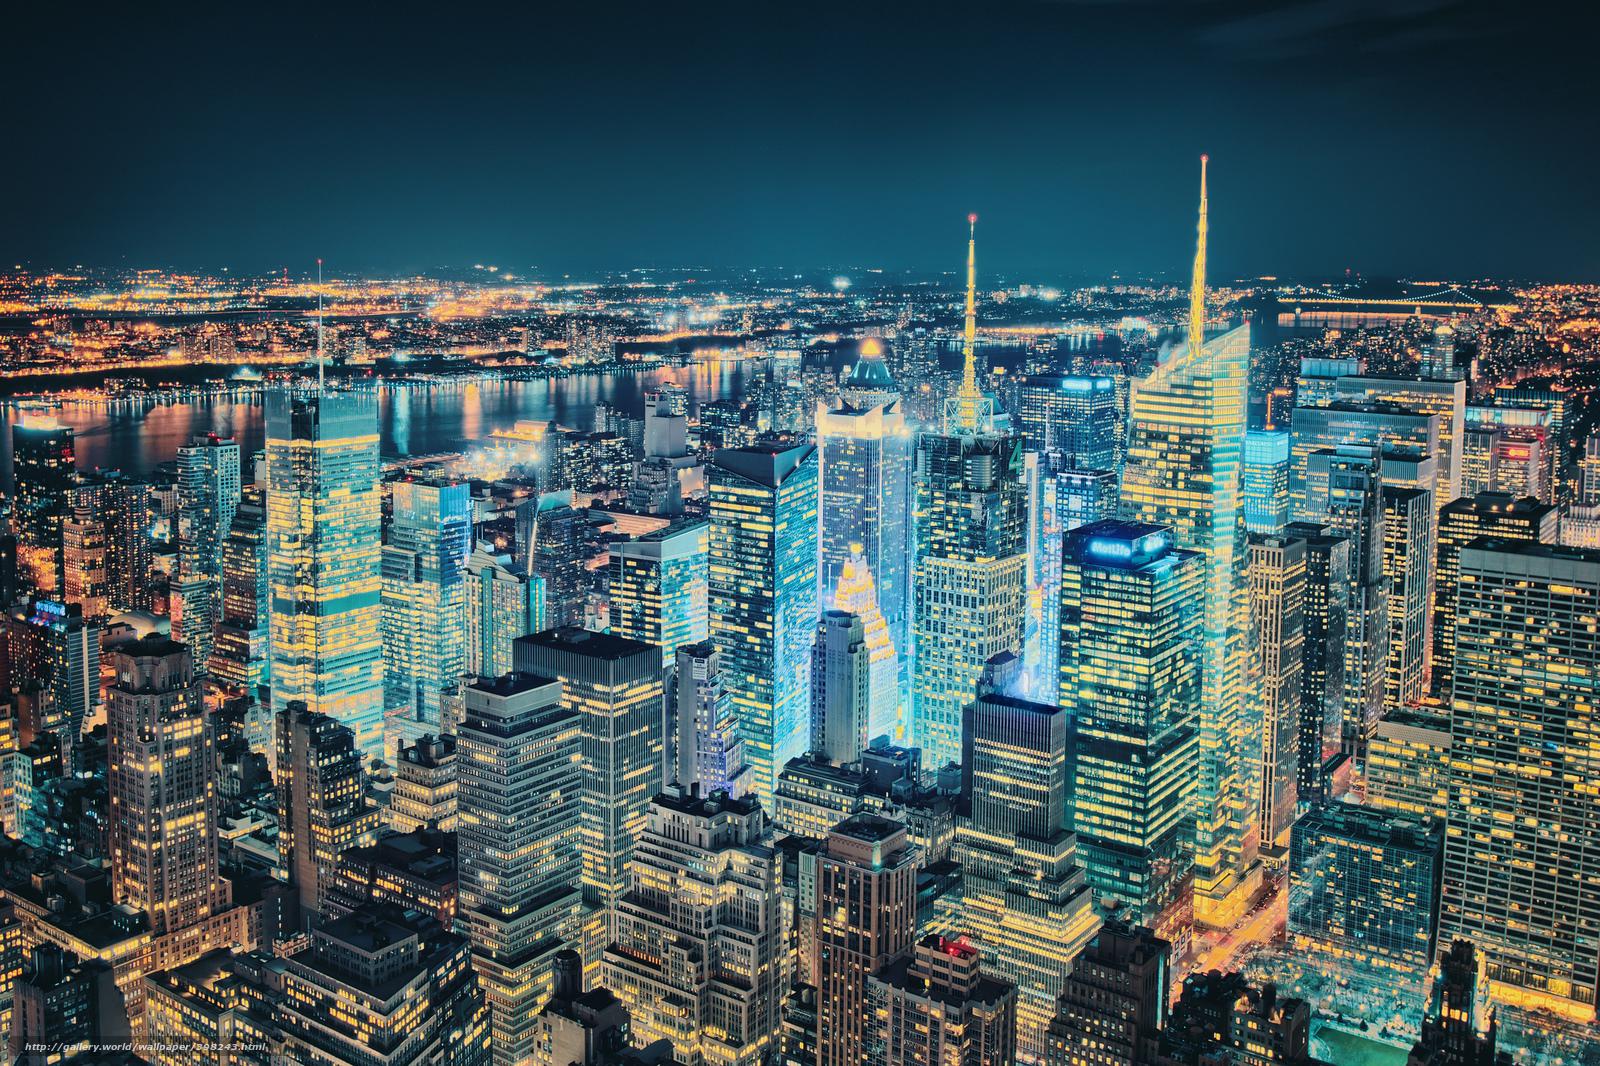 wallpaper New York evening night lights desktop wallpaper 1600x1066